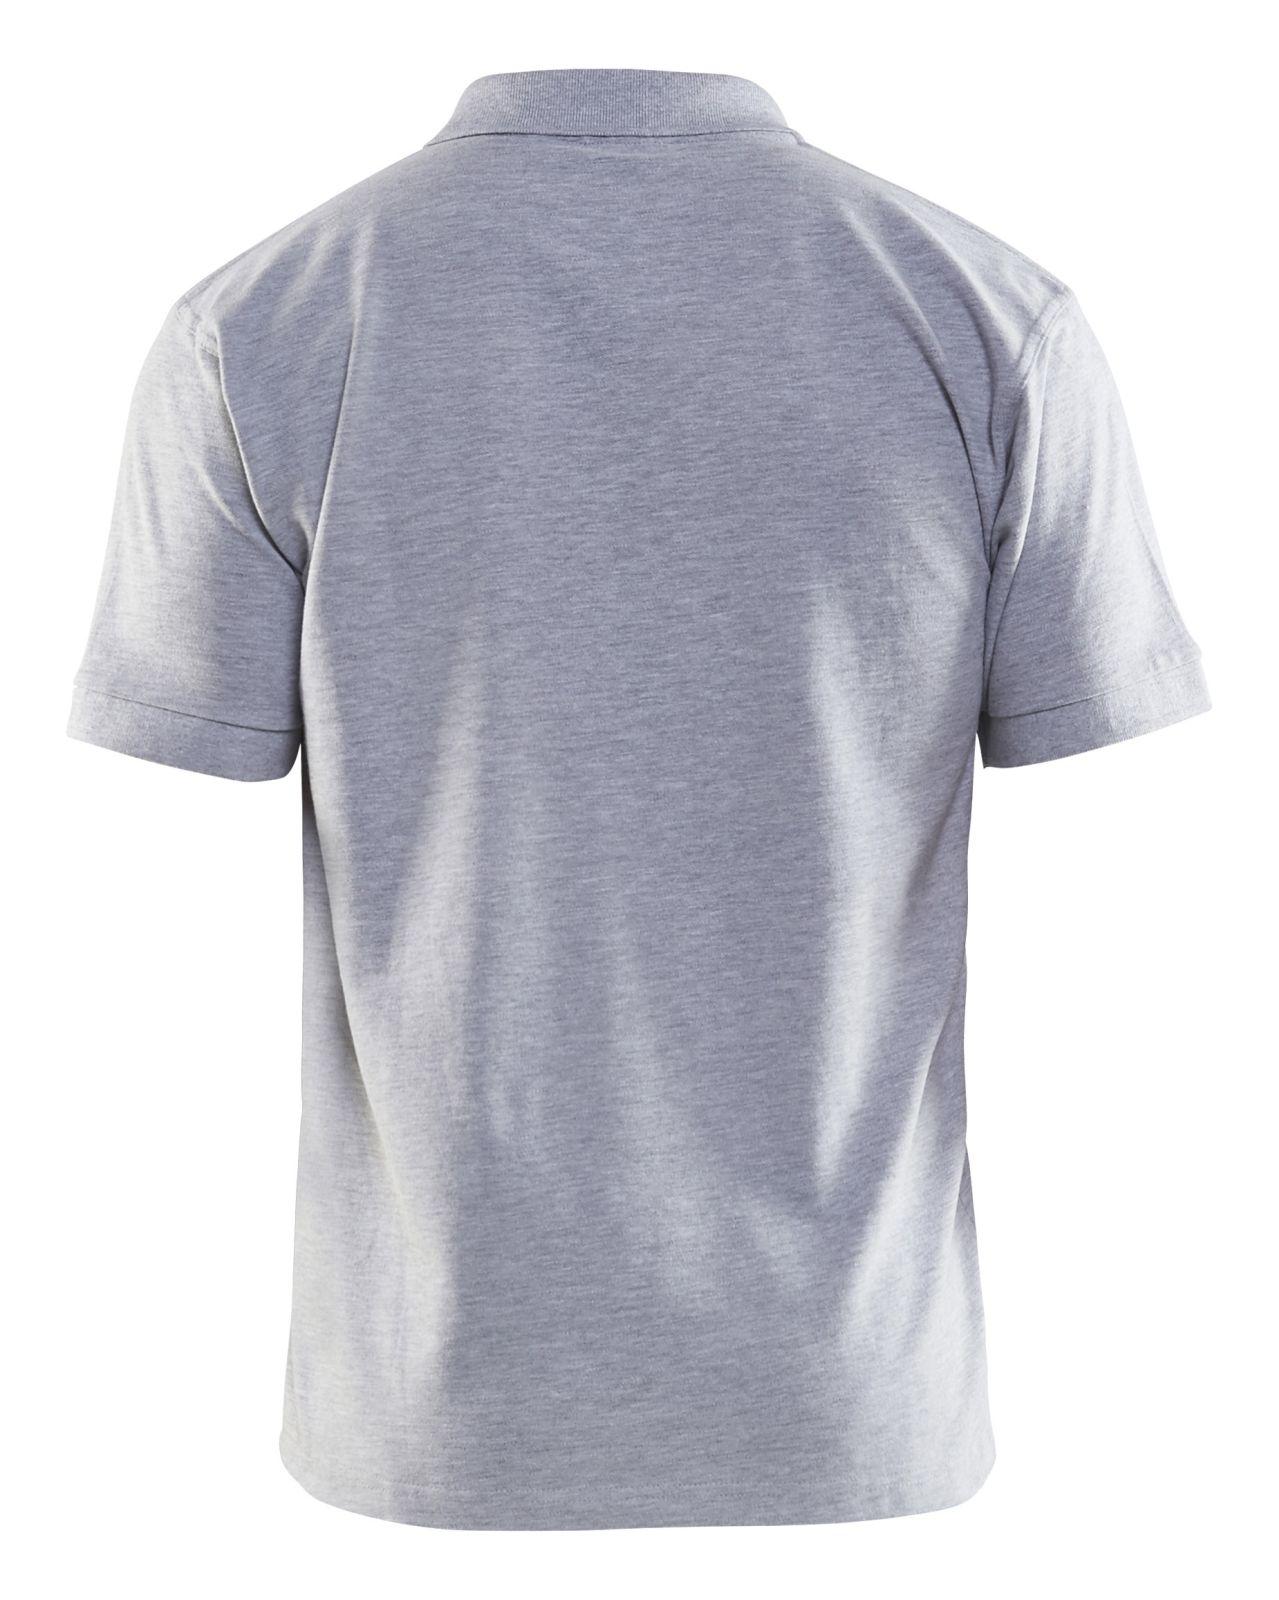 Blaklader Polo shirts 33051035 grijsmelee(9000)